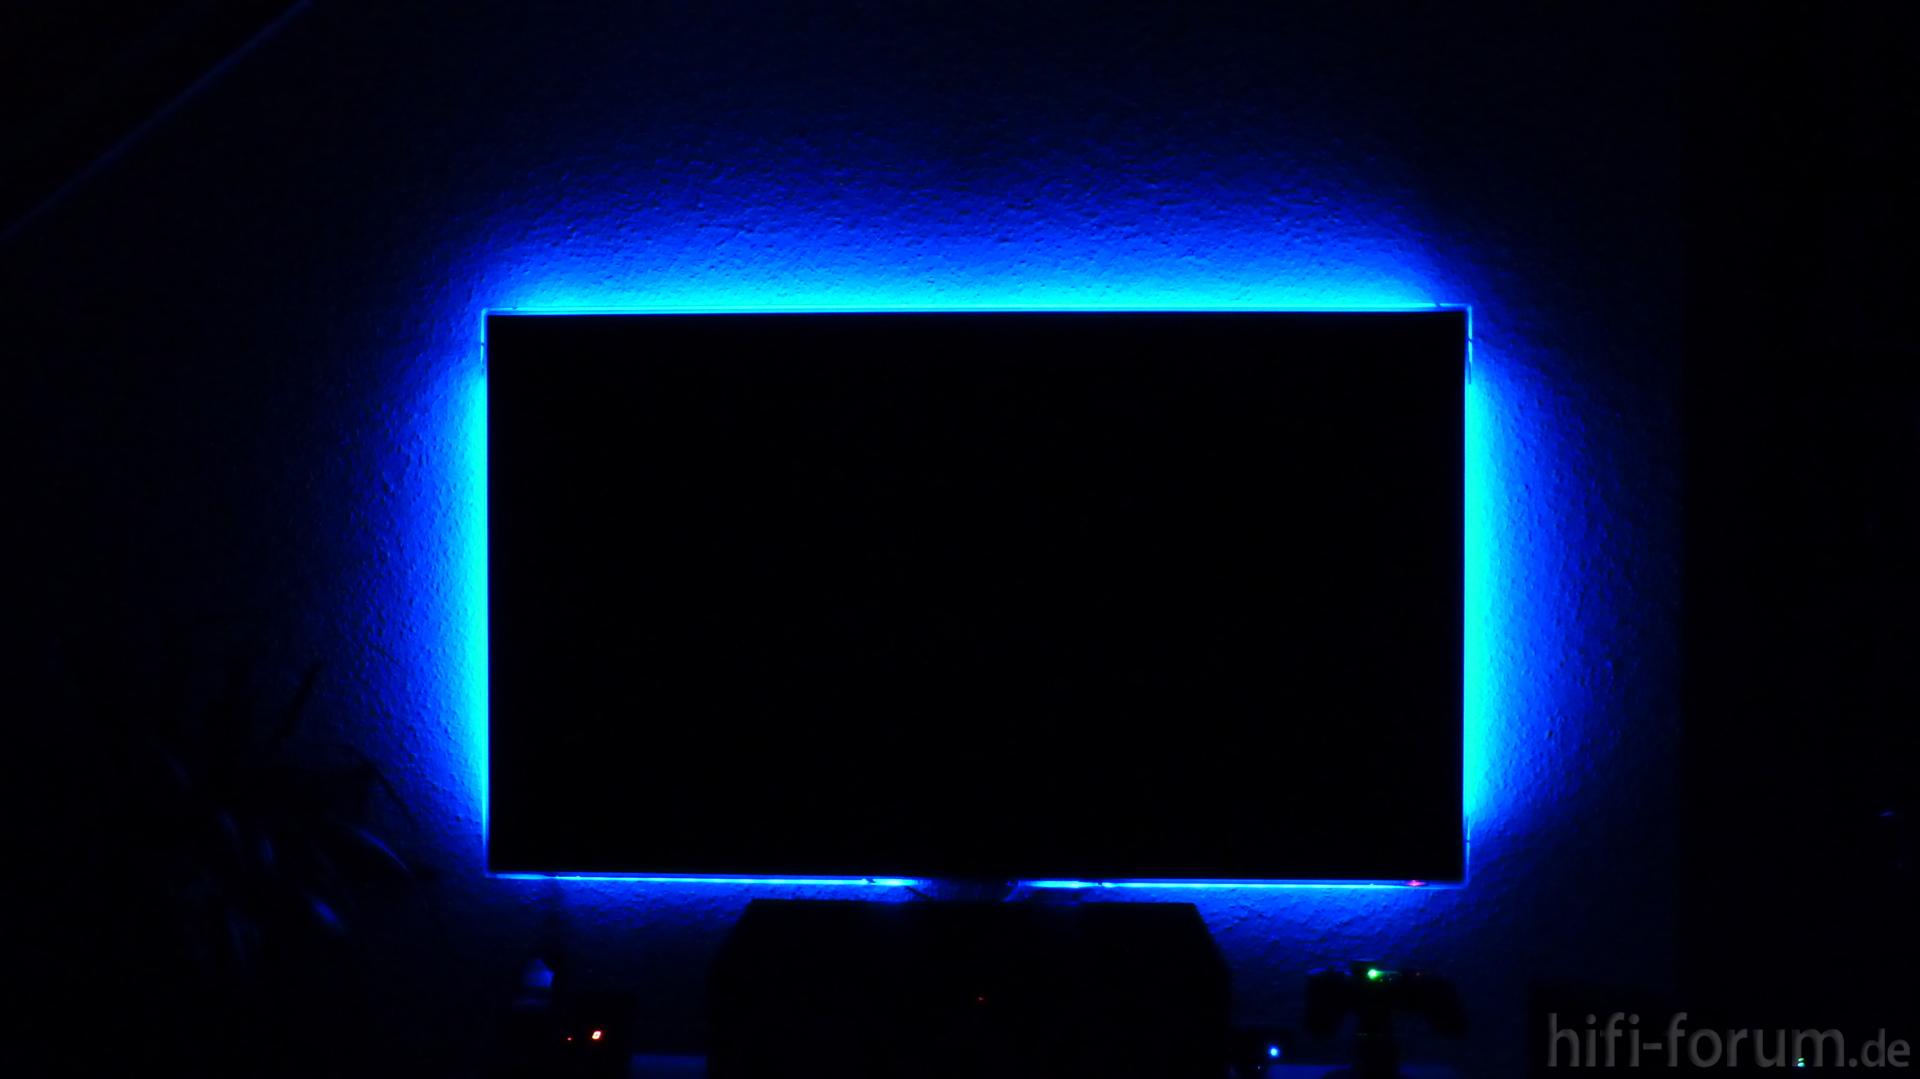 led streifen dioder led streifen hifi bildergalerie. Black Bedroom Furniture Sets. Home Design Ideas